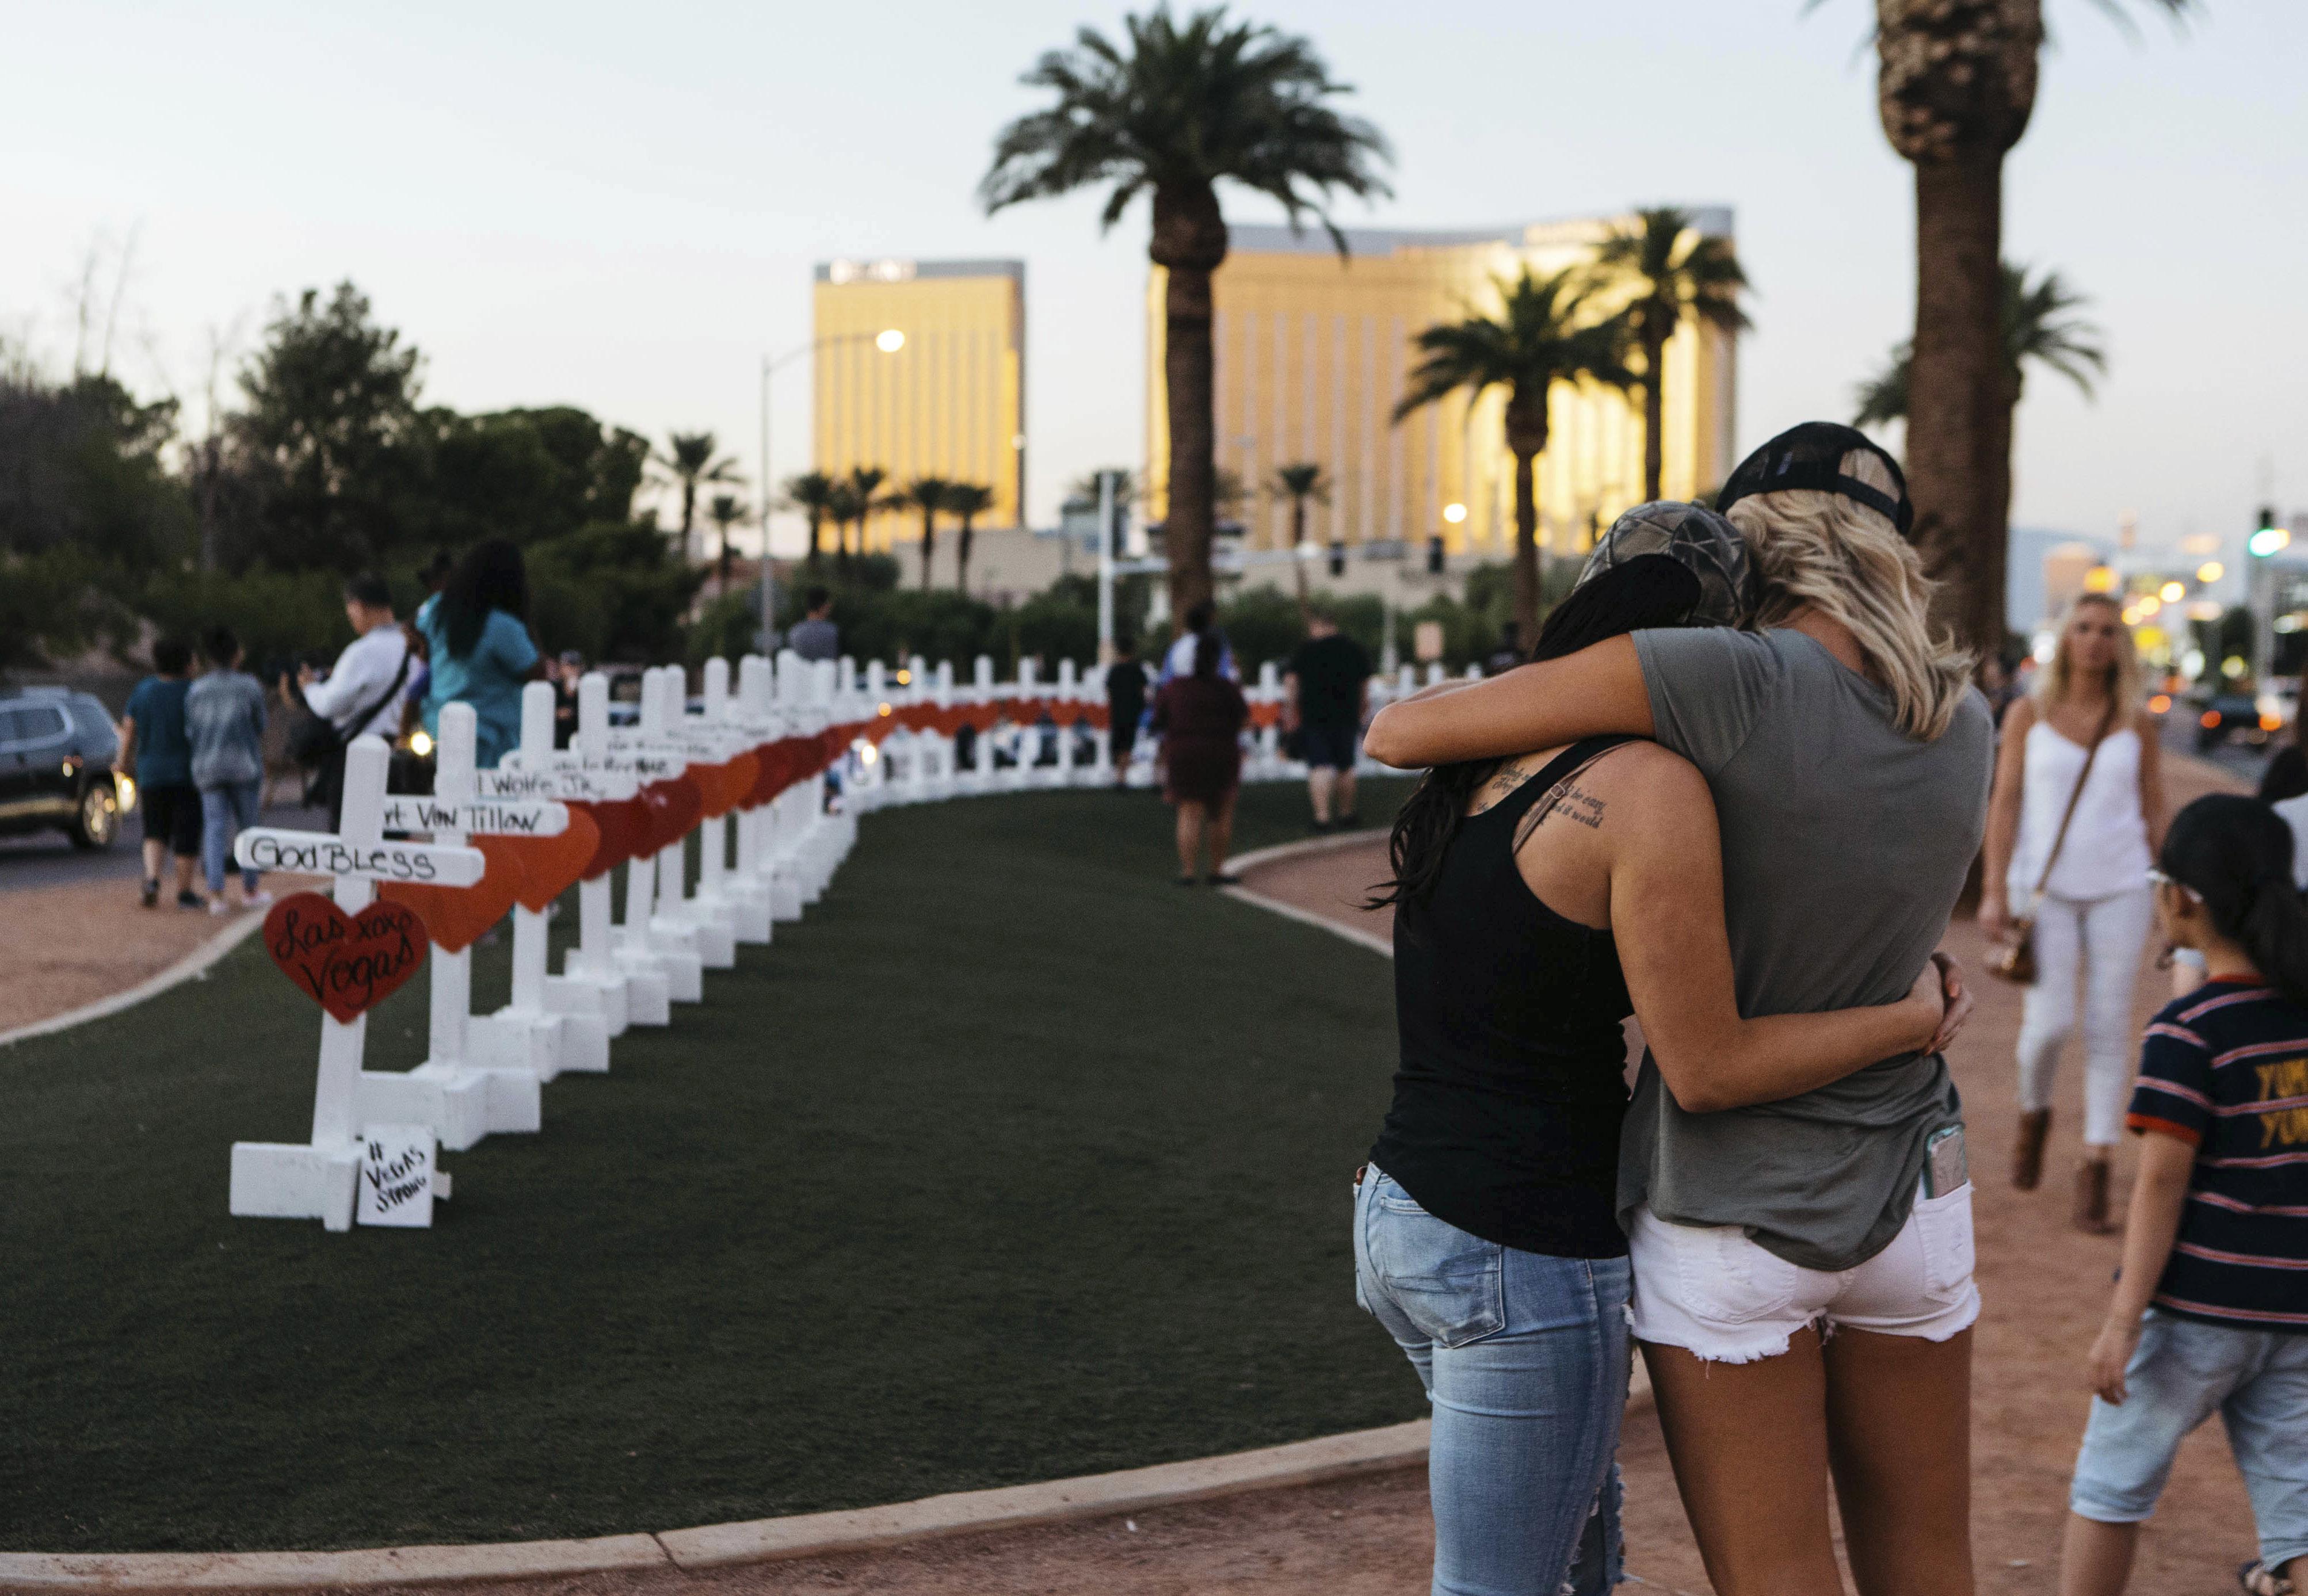 Presidential hopefuls invited to gun control forum in Vegas